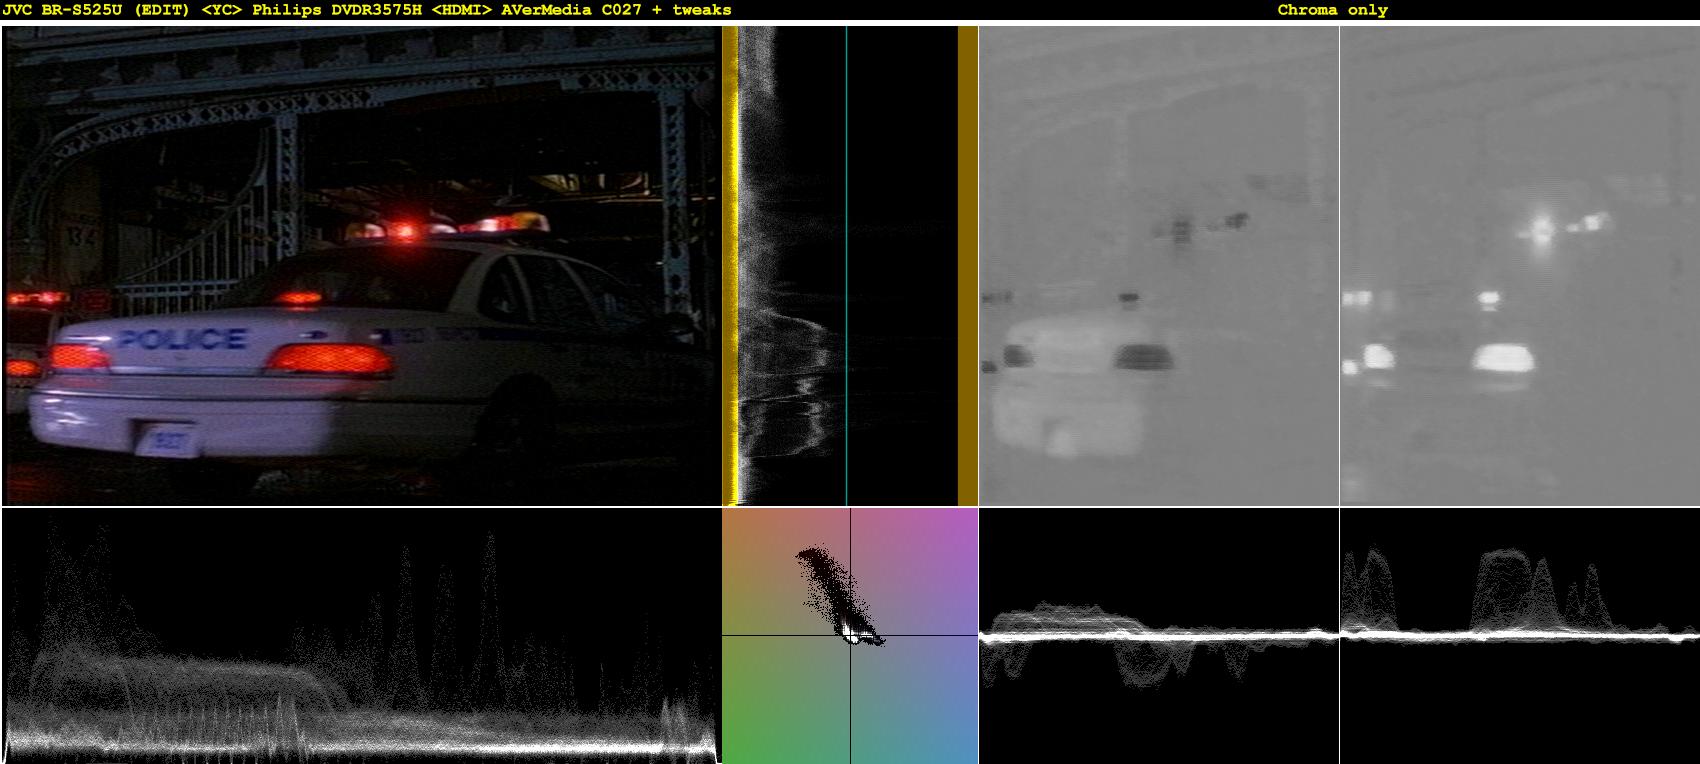 Click image for larger version  Name:0-55-31 - JVC BR-S525U (EDIT).png Views:1346 Size:862.7 KB ID:37676